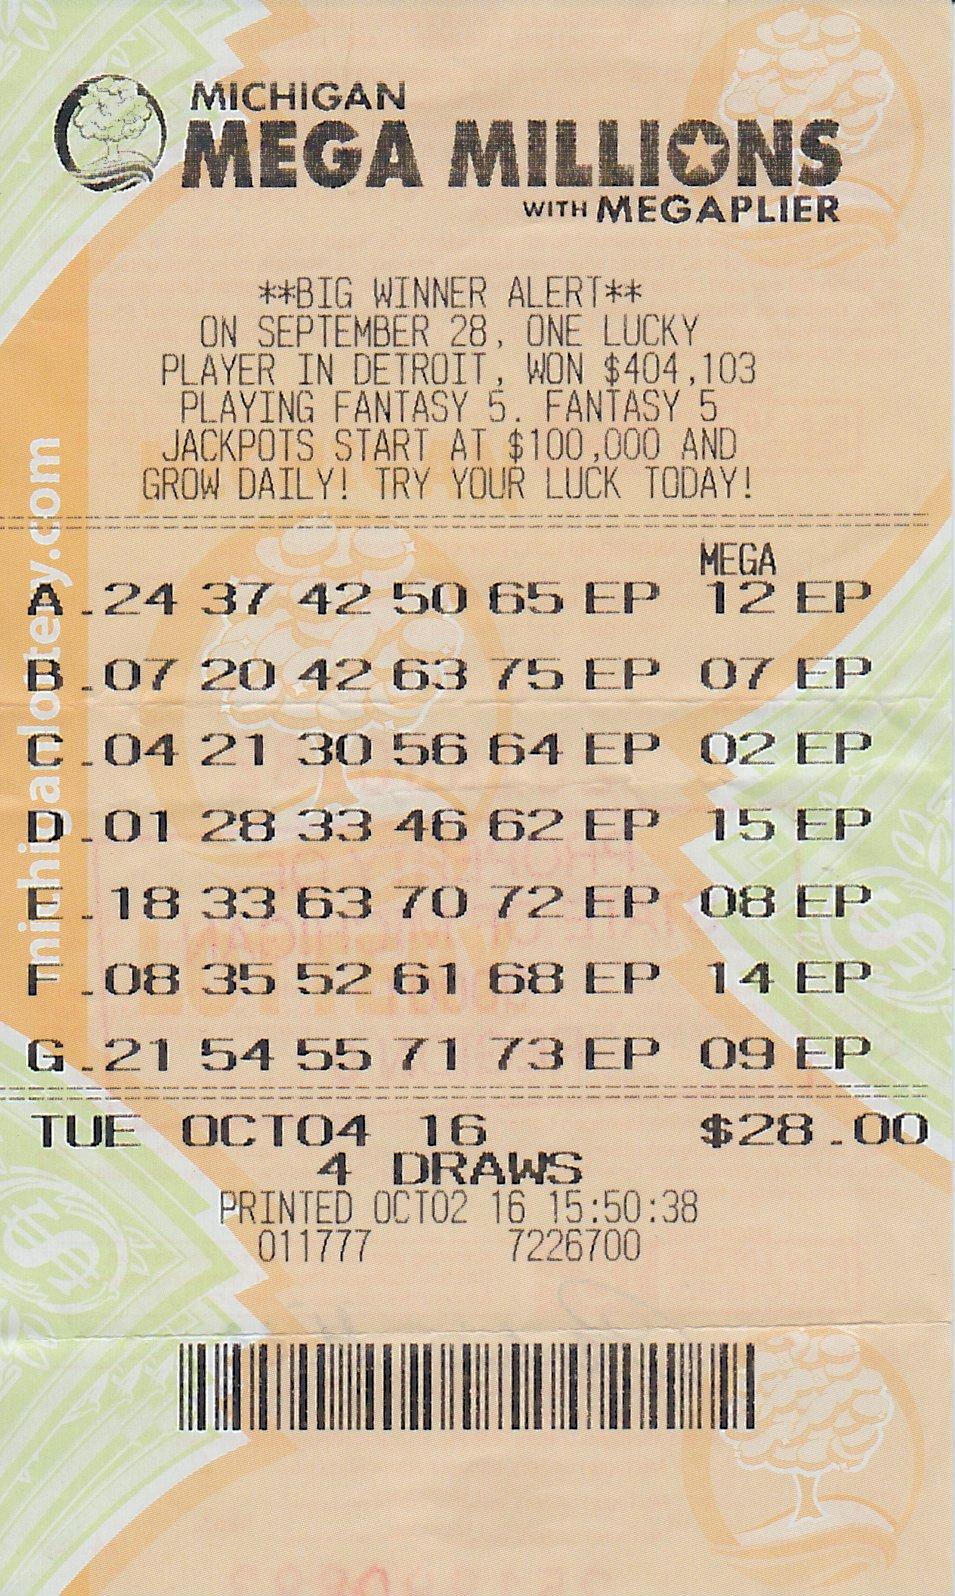 Wayne County Lottery Club Wins $1 Million Mega Millions